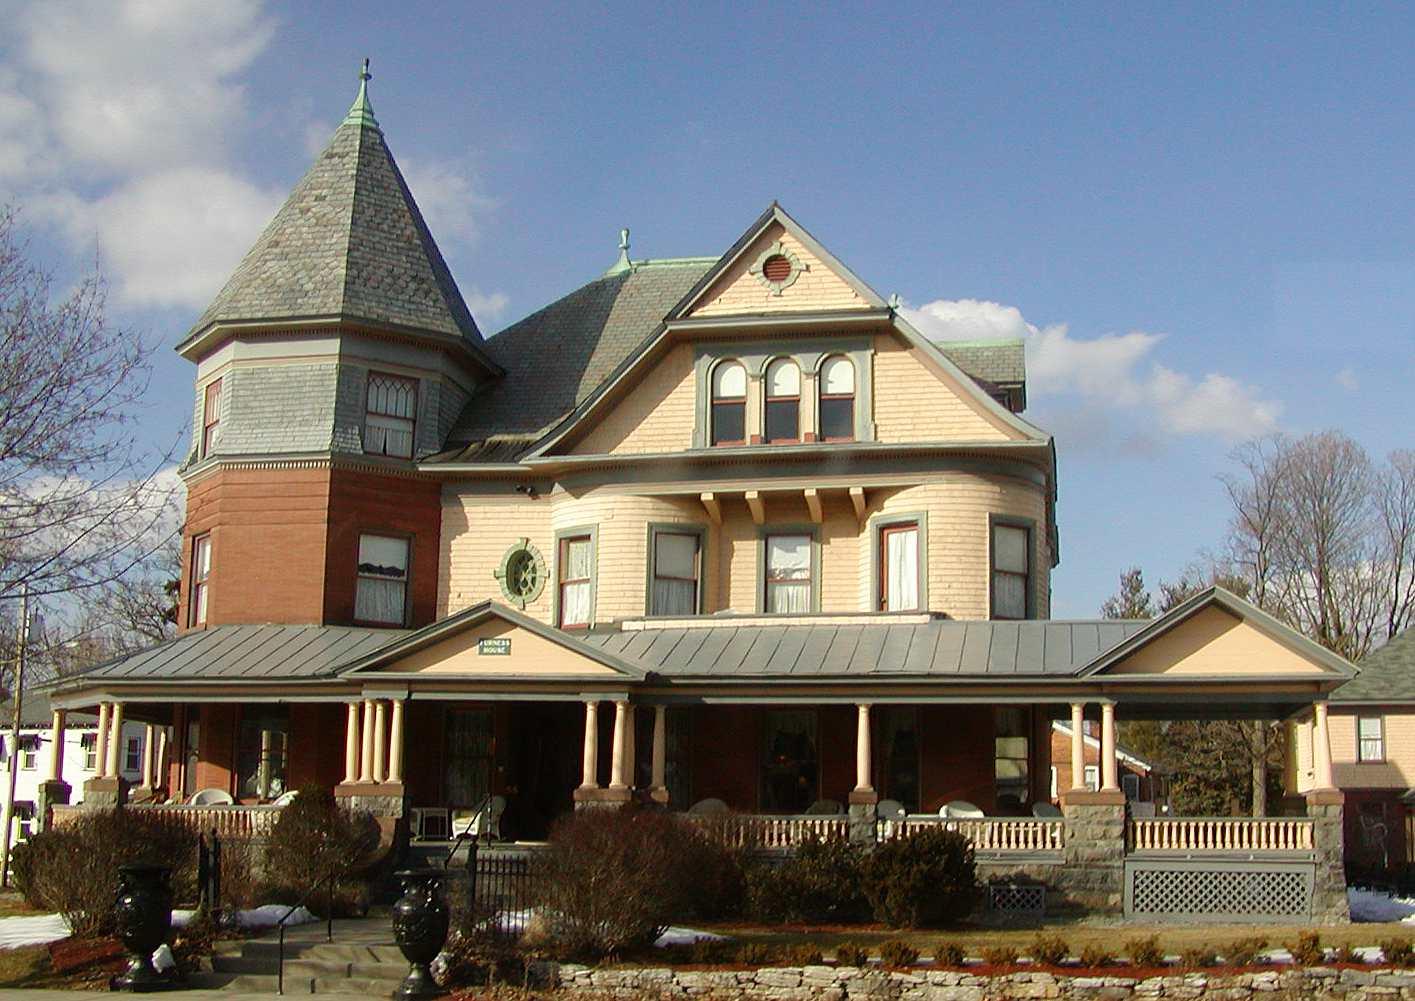 Queen Anne maison à Saratoga, New York